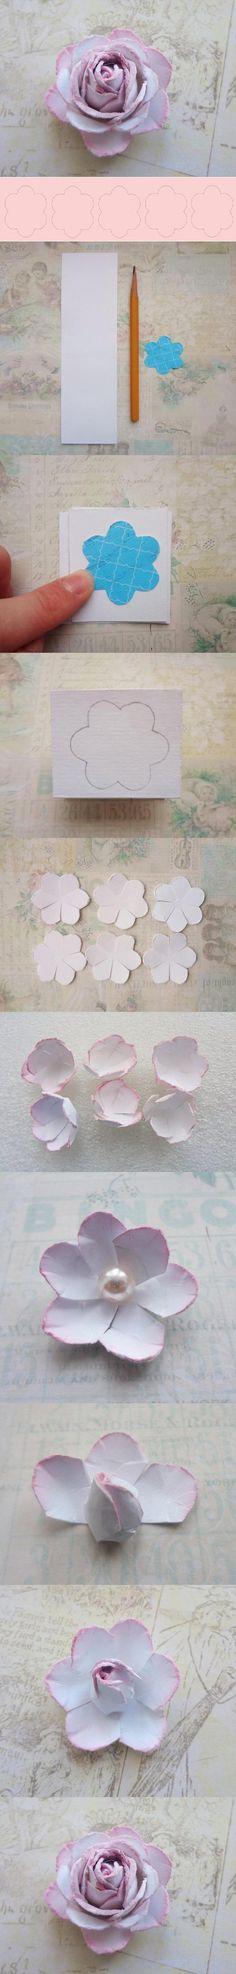 DIY Handmade Rosettes